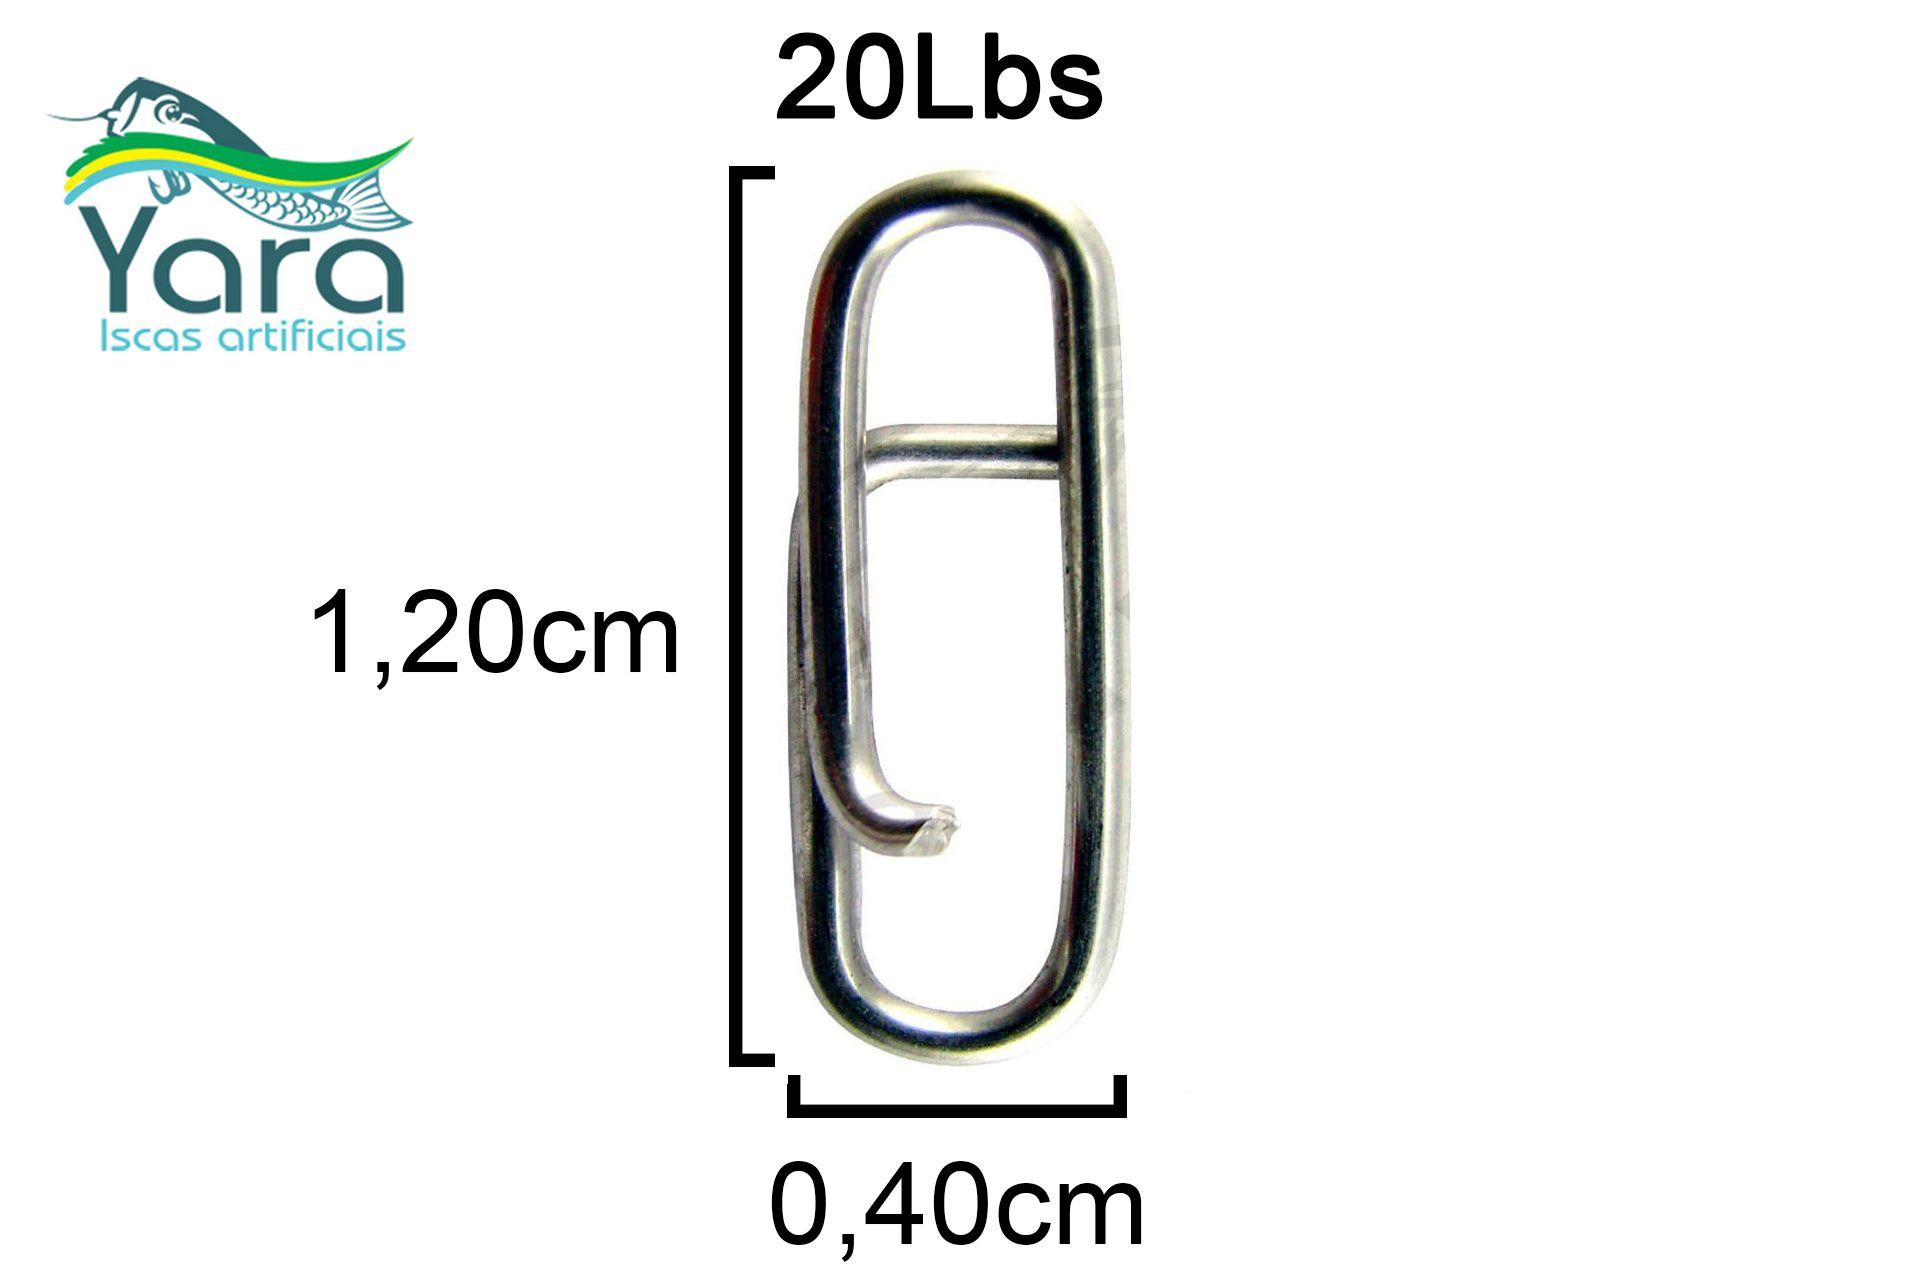 Snap Engate Rápido Yara - 20Lbs - 10 Unidades  - Life Pesca - Sua loja de Pesca, Camping e Lazer